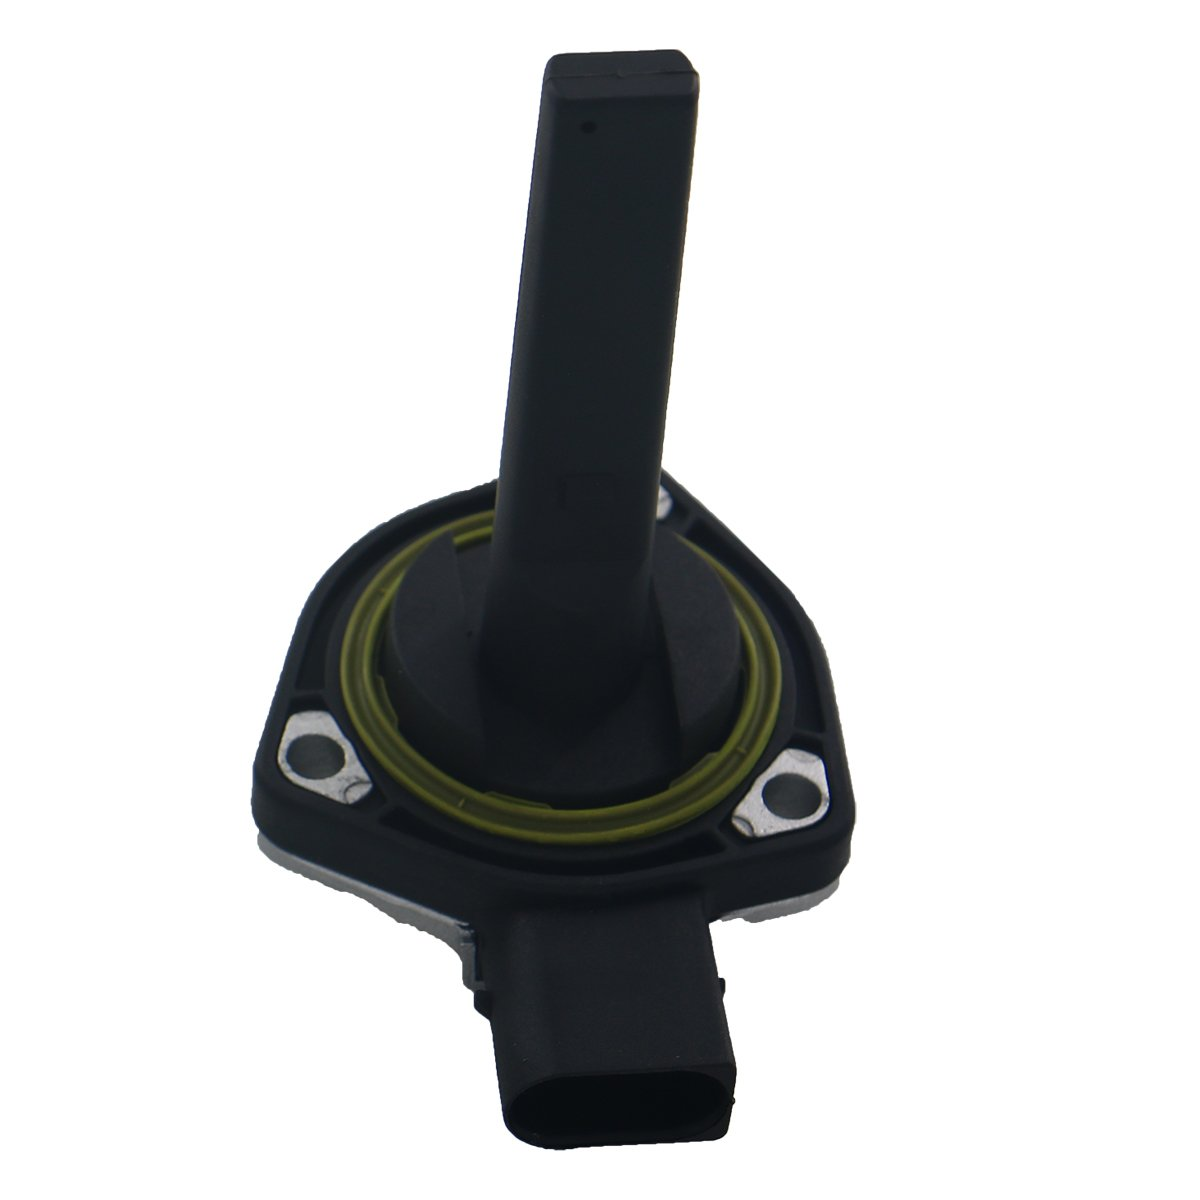 MUCO12611439810 Oil Level Sensor fit BMW E87 E83 E91 E46 E39 E38 E61 E66 Z8